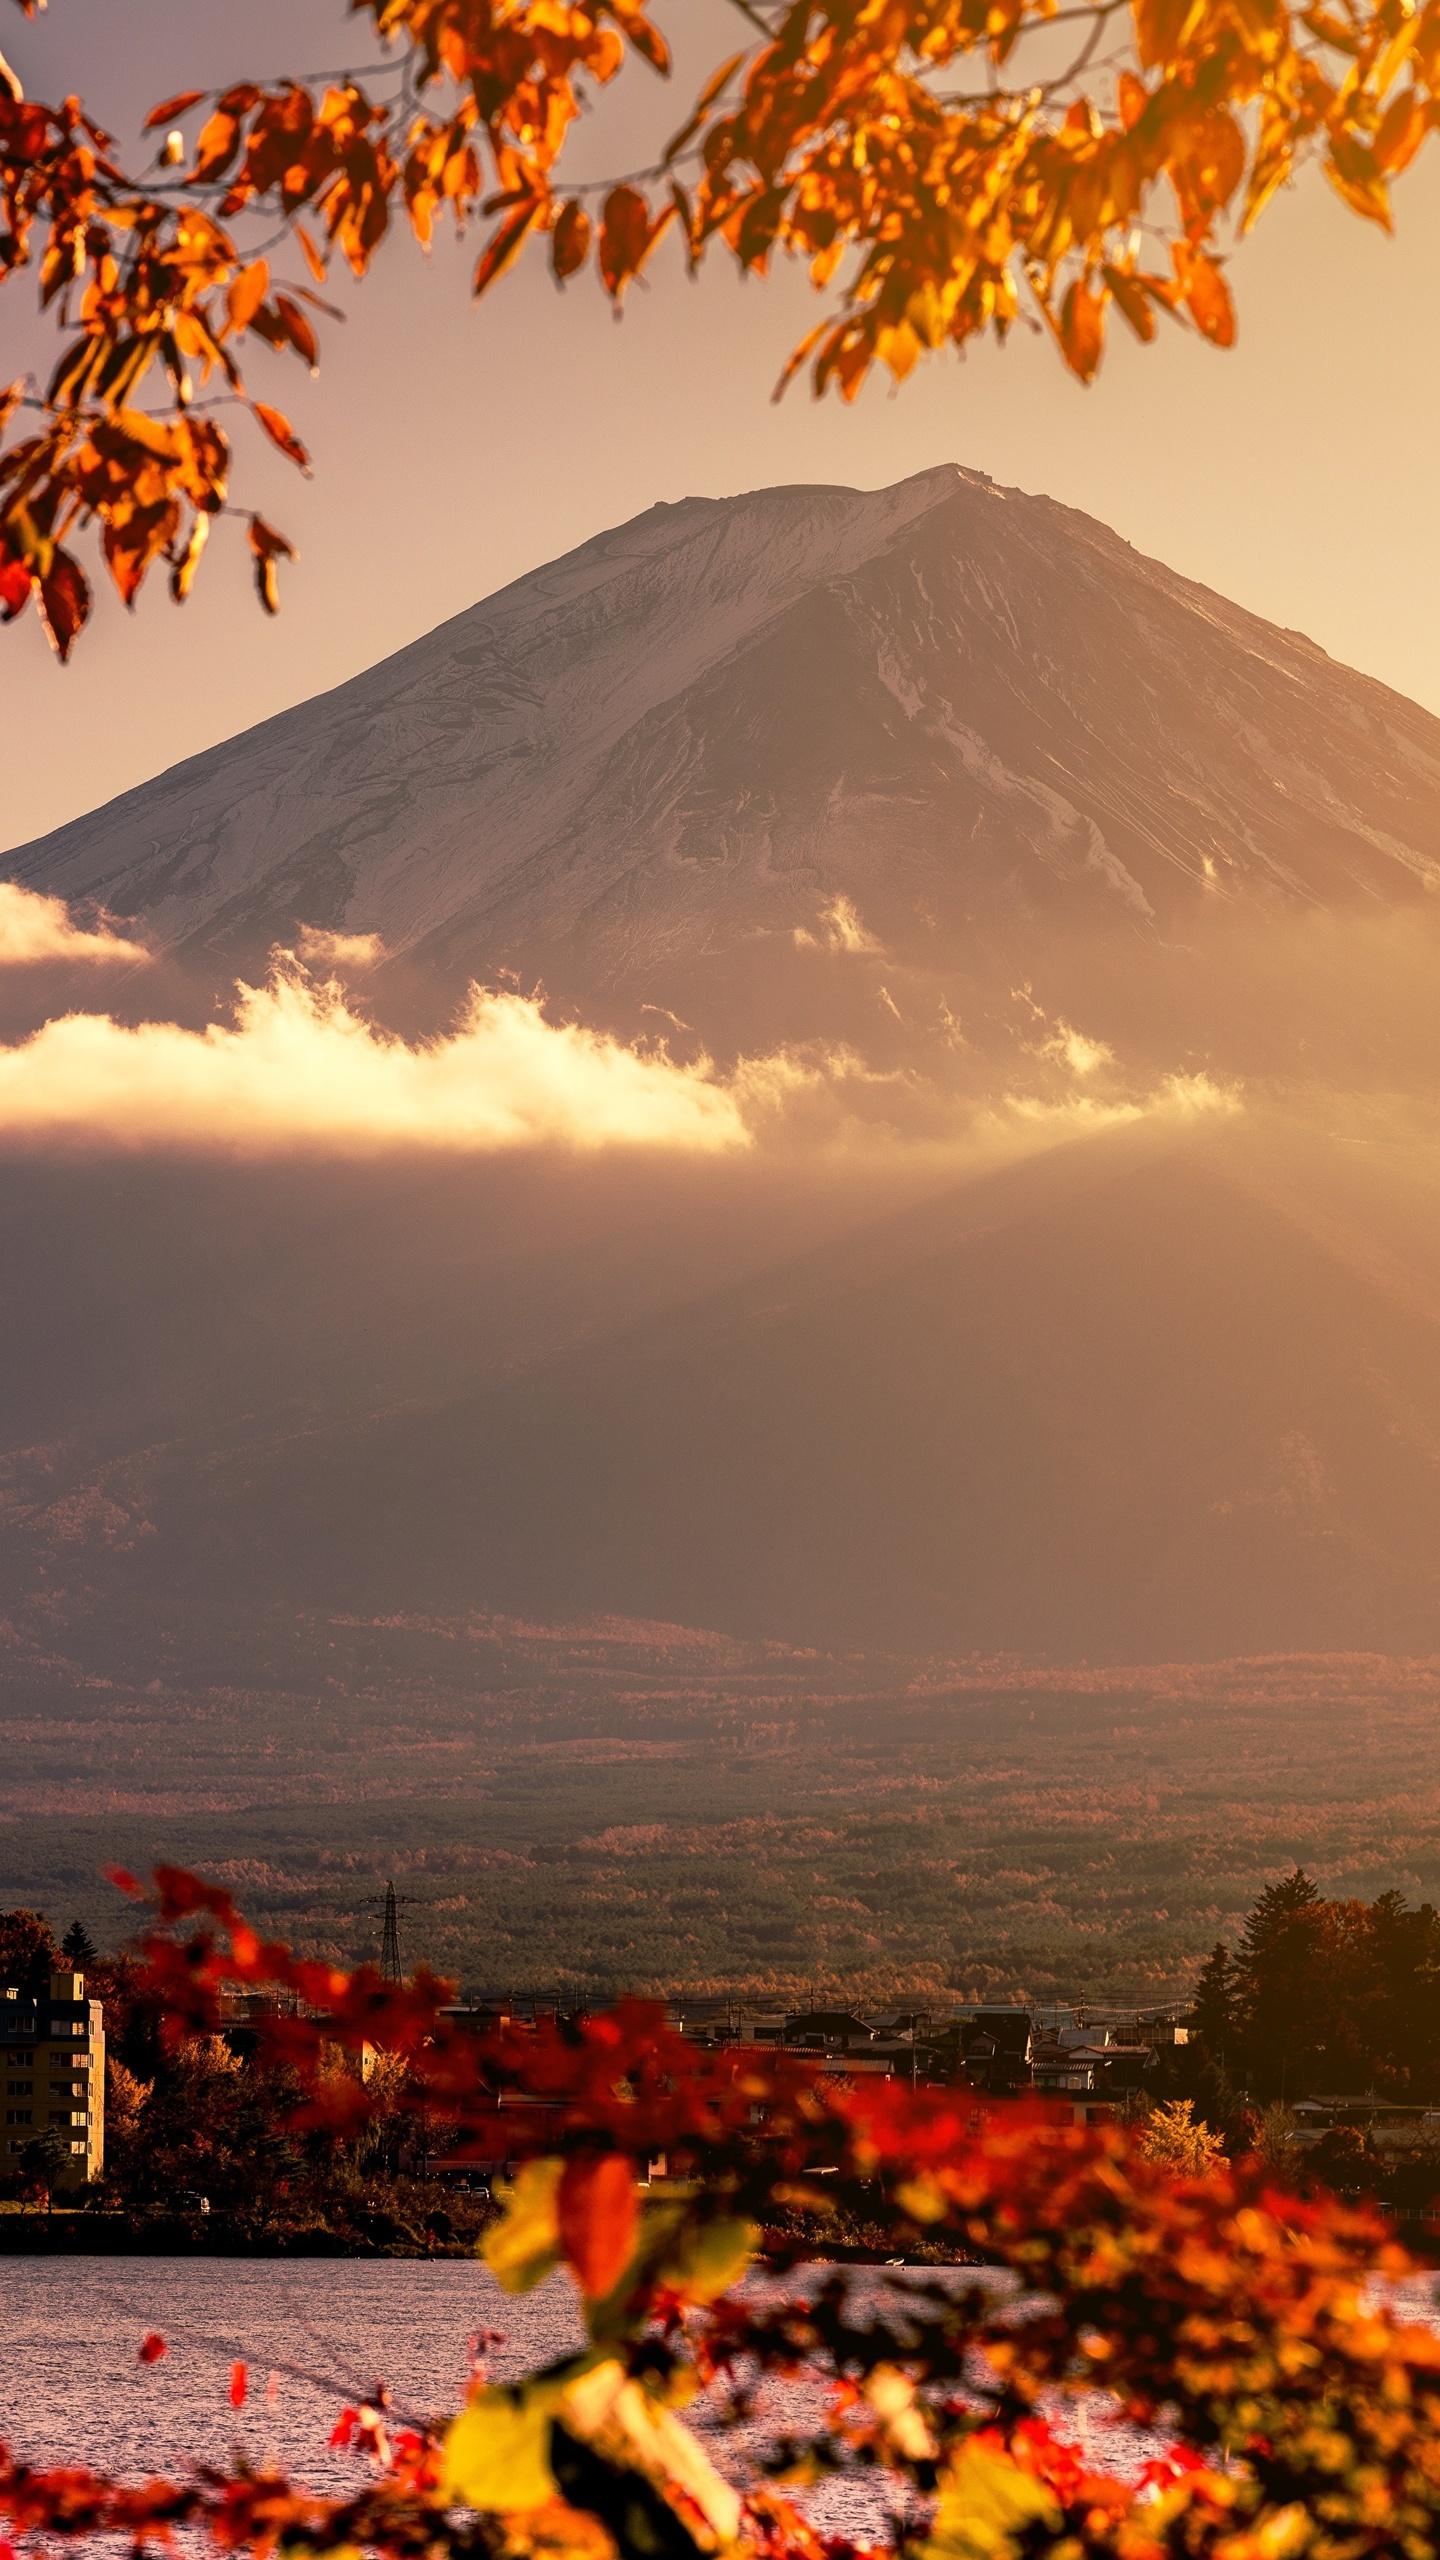 mount-fuji-volcano-morning-5k-wr.jpg